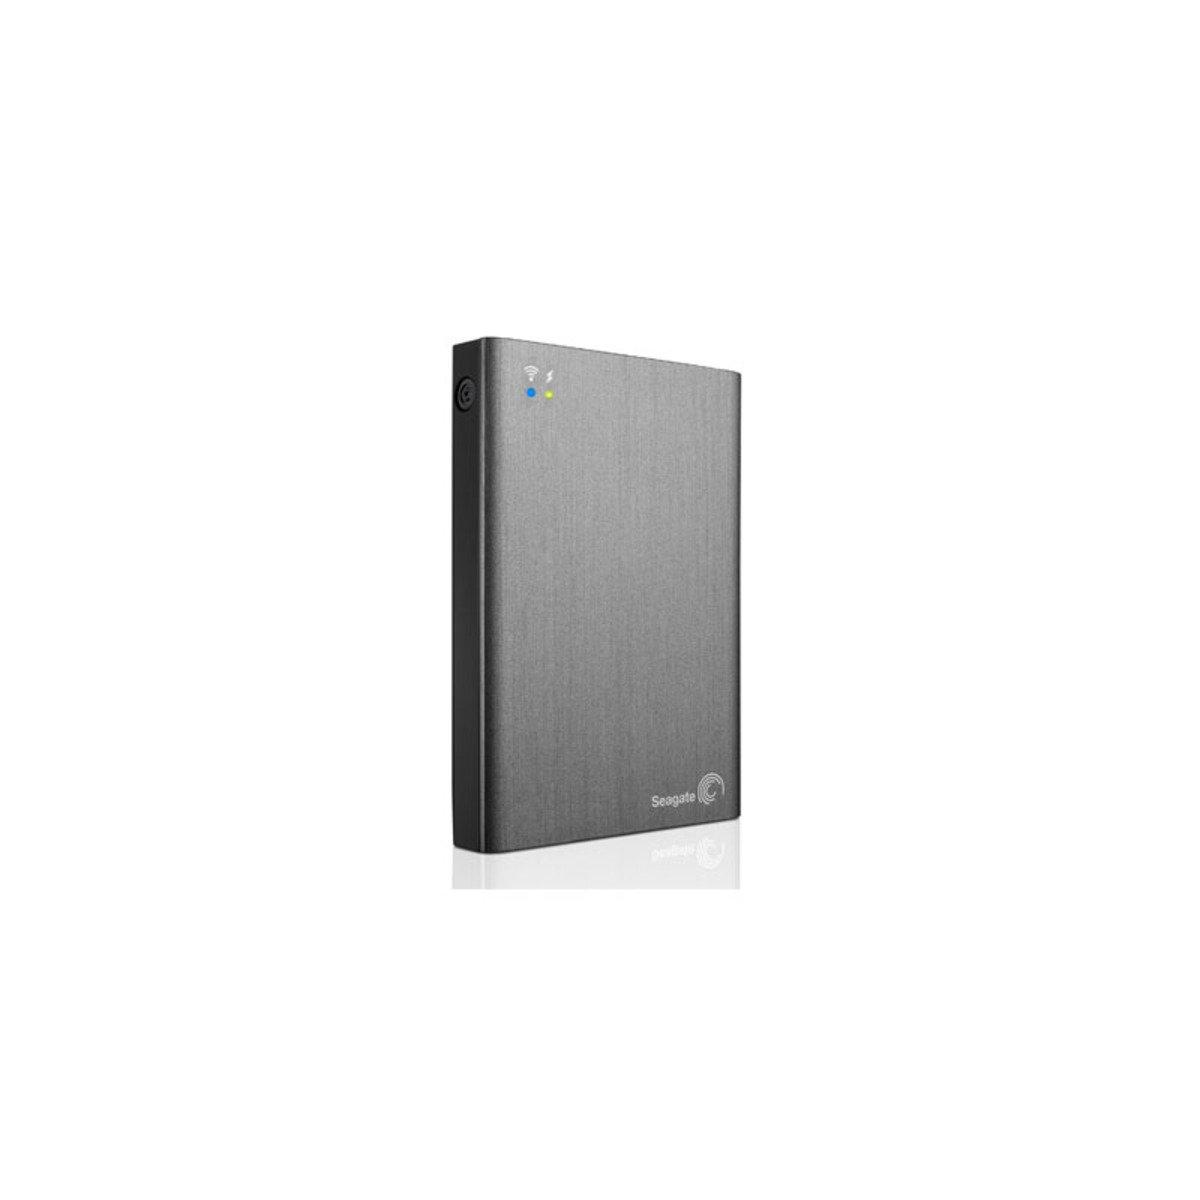 Wireless Plus 1TB 充電式無線外置硬碟 STCK1000300